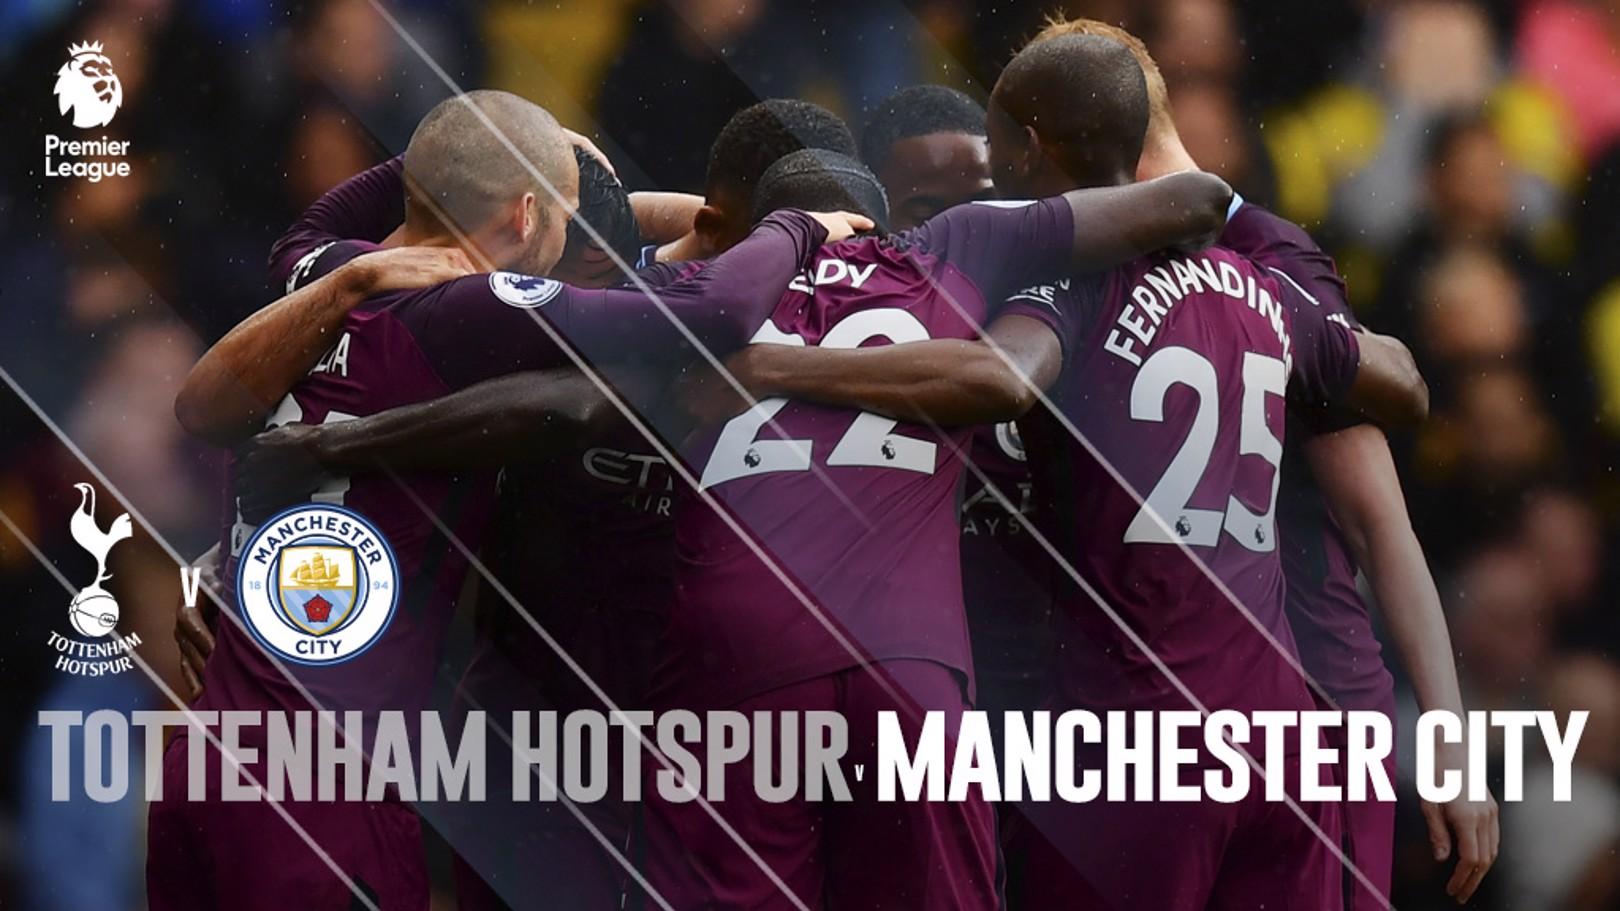 Tottenham - Manchester City.